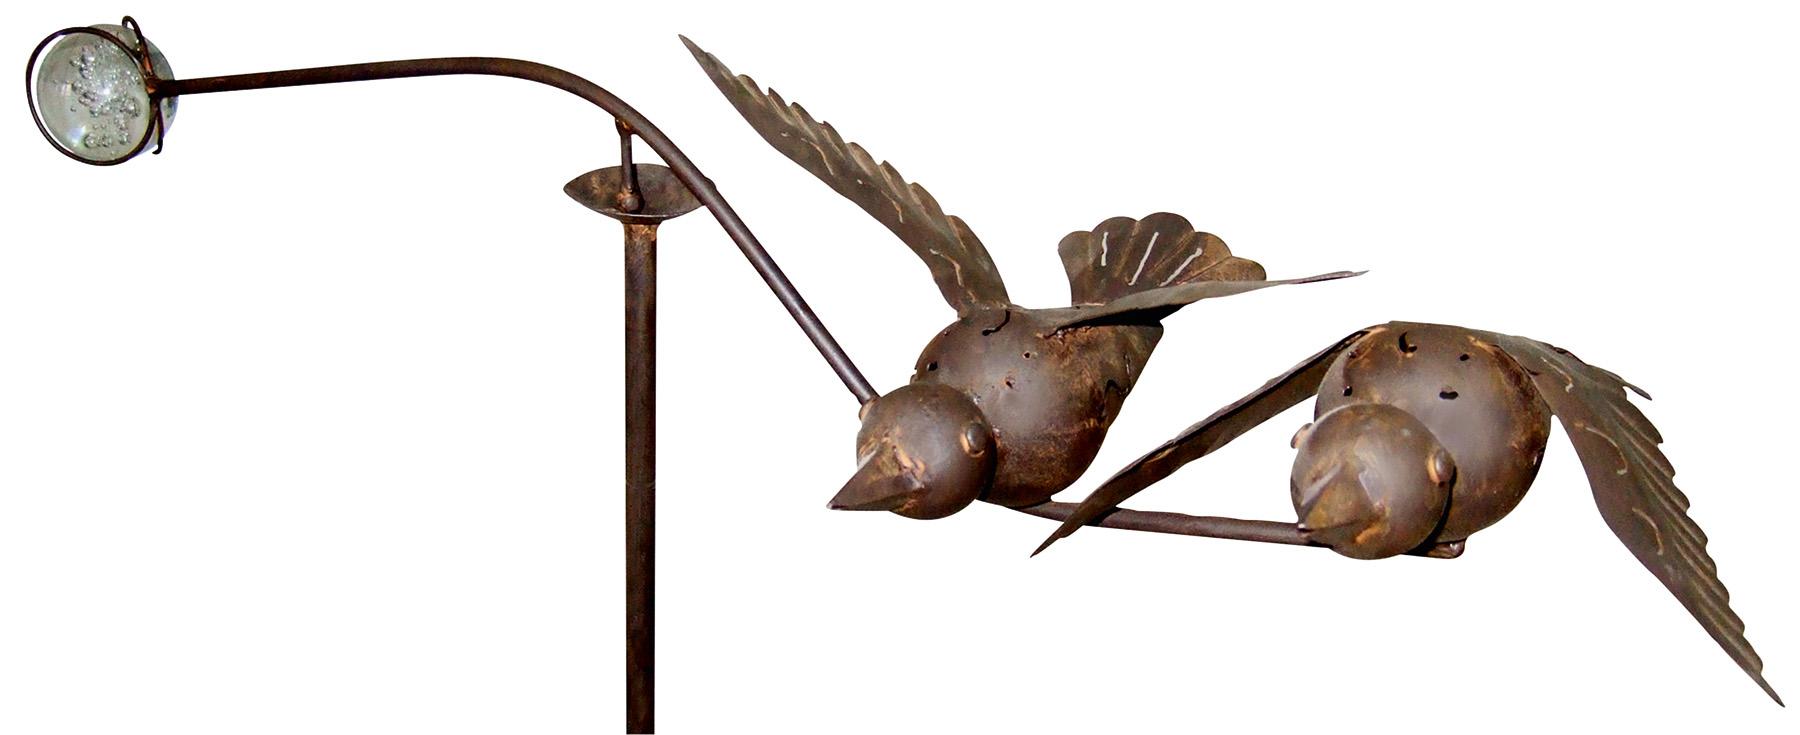 windspiel vogelpaar metall garten balancer mit glaskugel. Black Bedroom Furniture Sets. Home Design Ideas